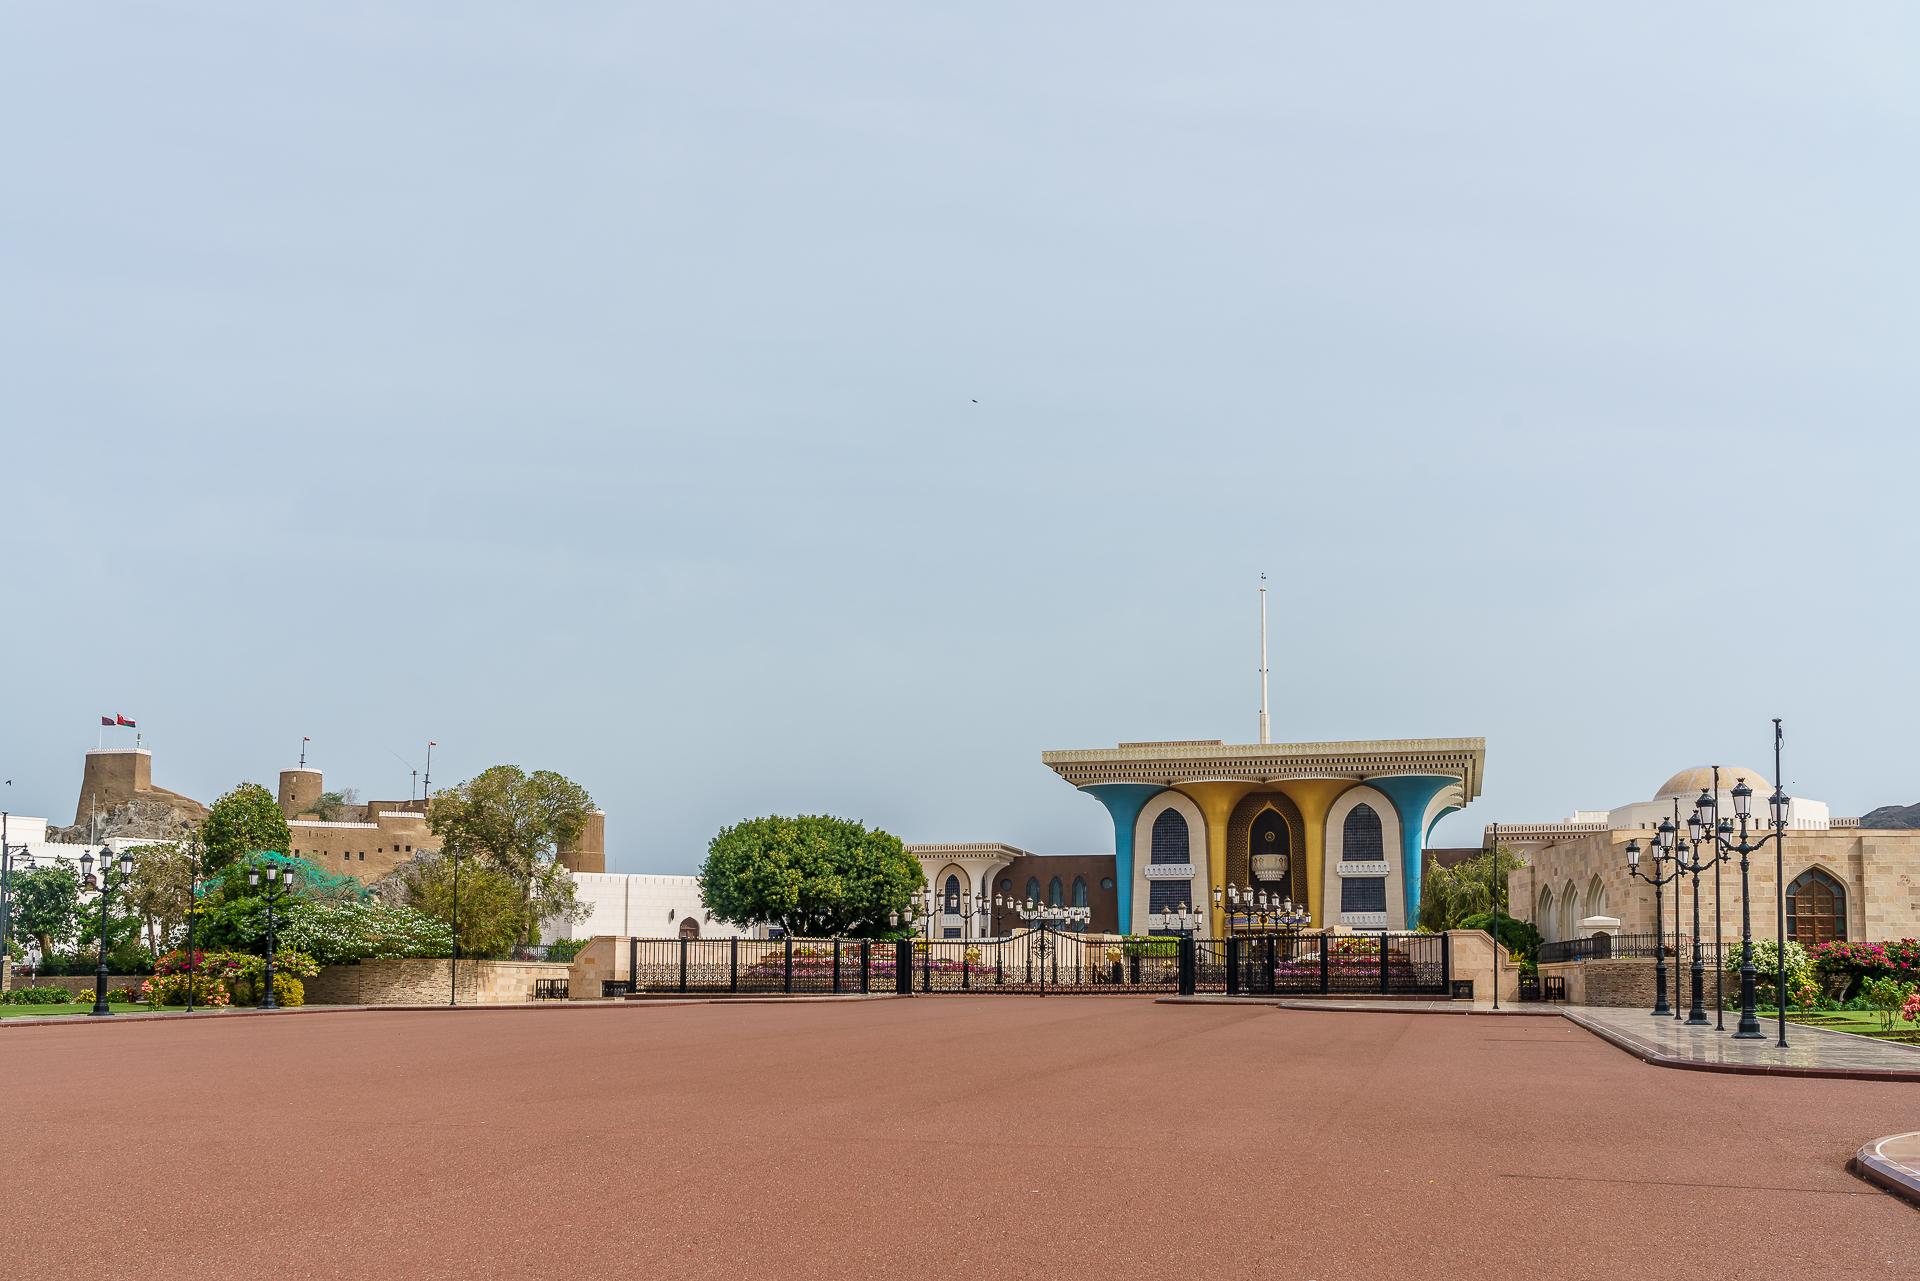 Sultanspalast-Qasr-al-Alam-Muscat